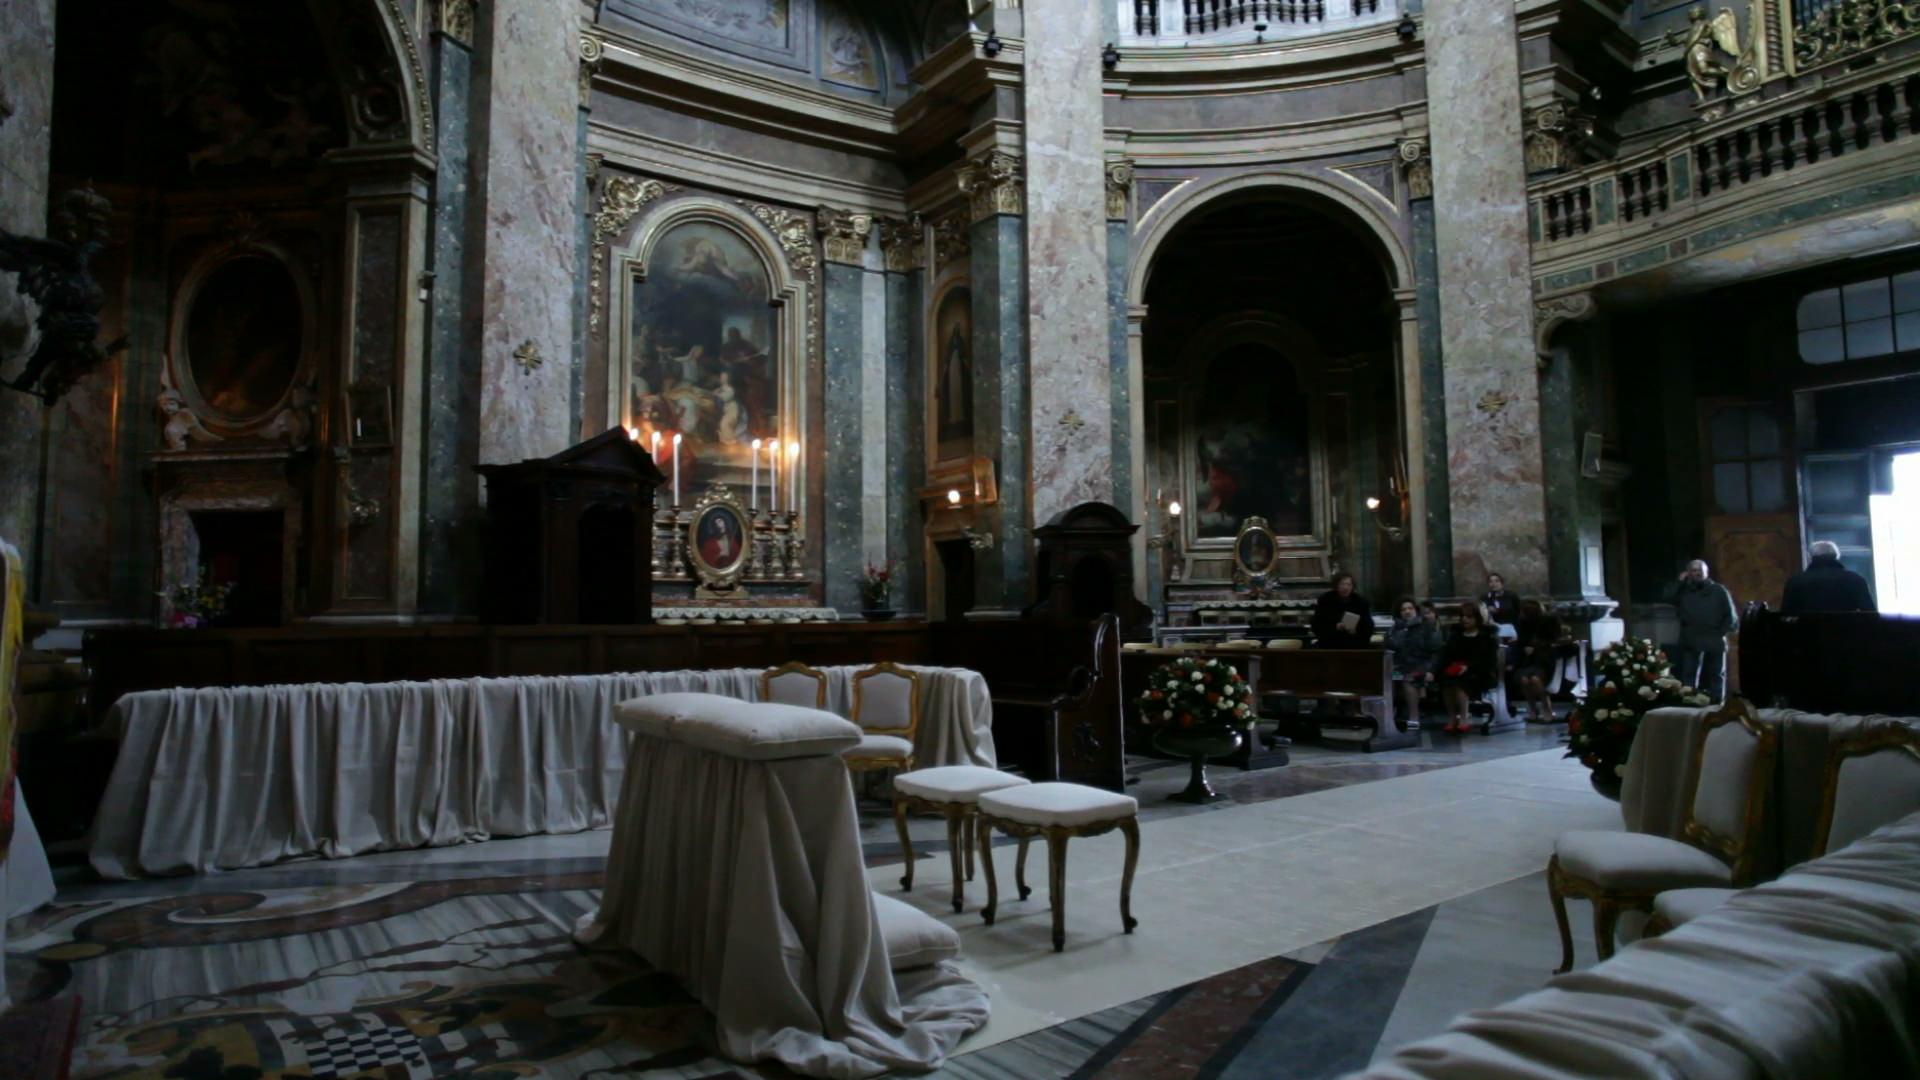 wedding rome galleria cardinale00004.jpeg